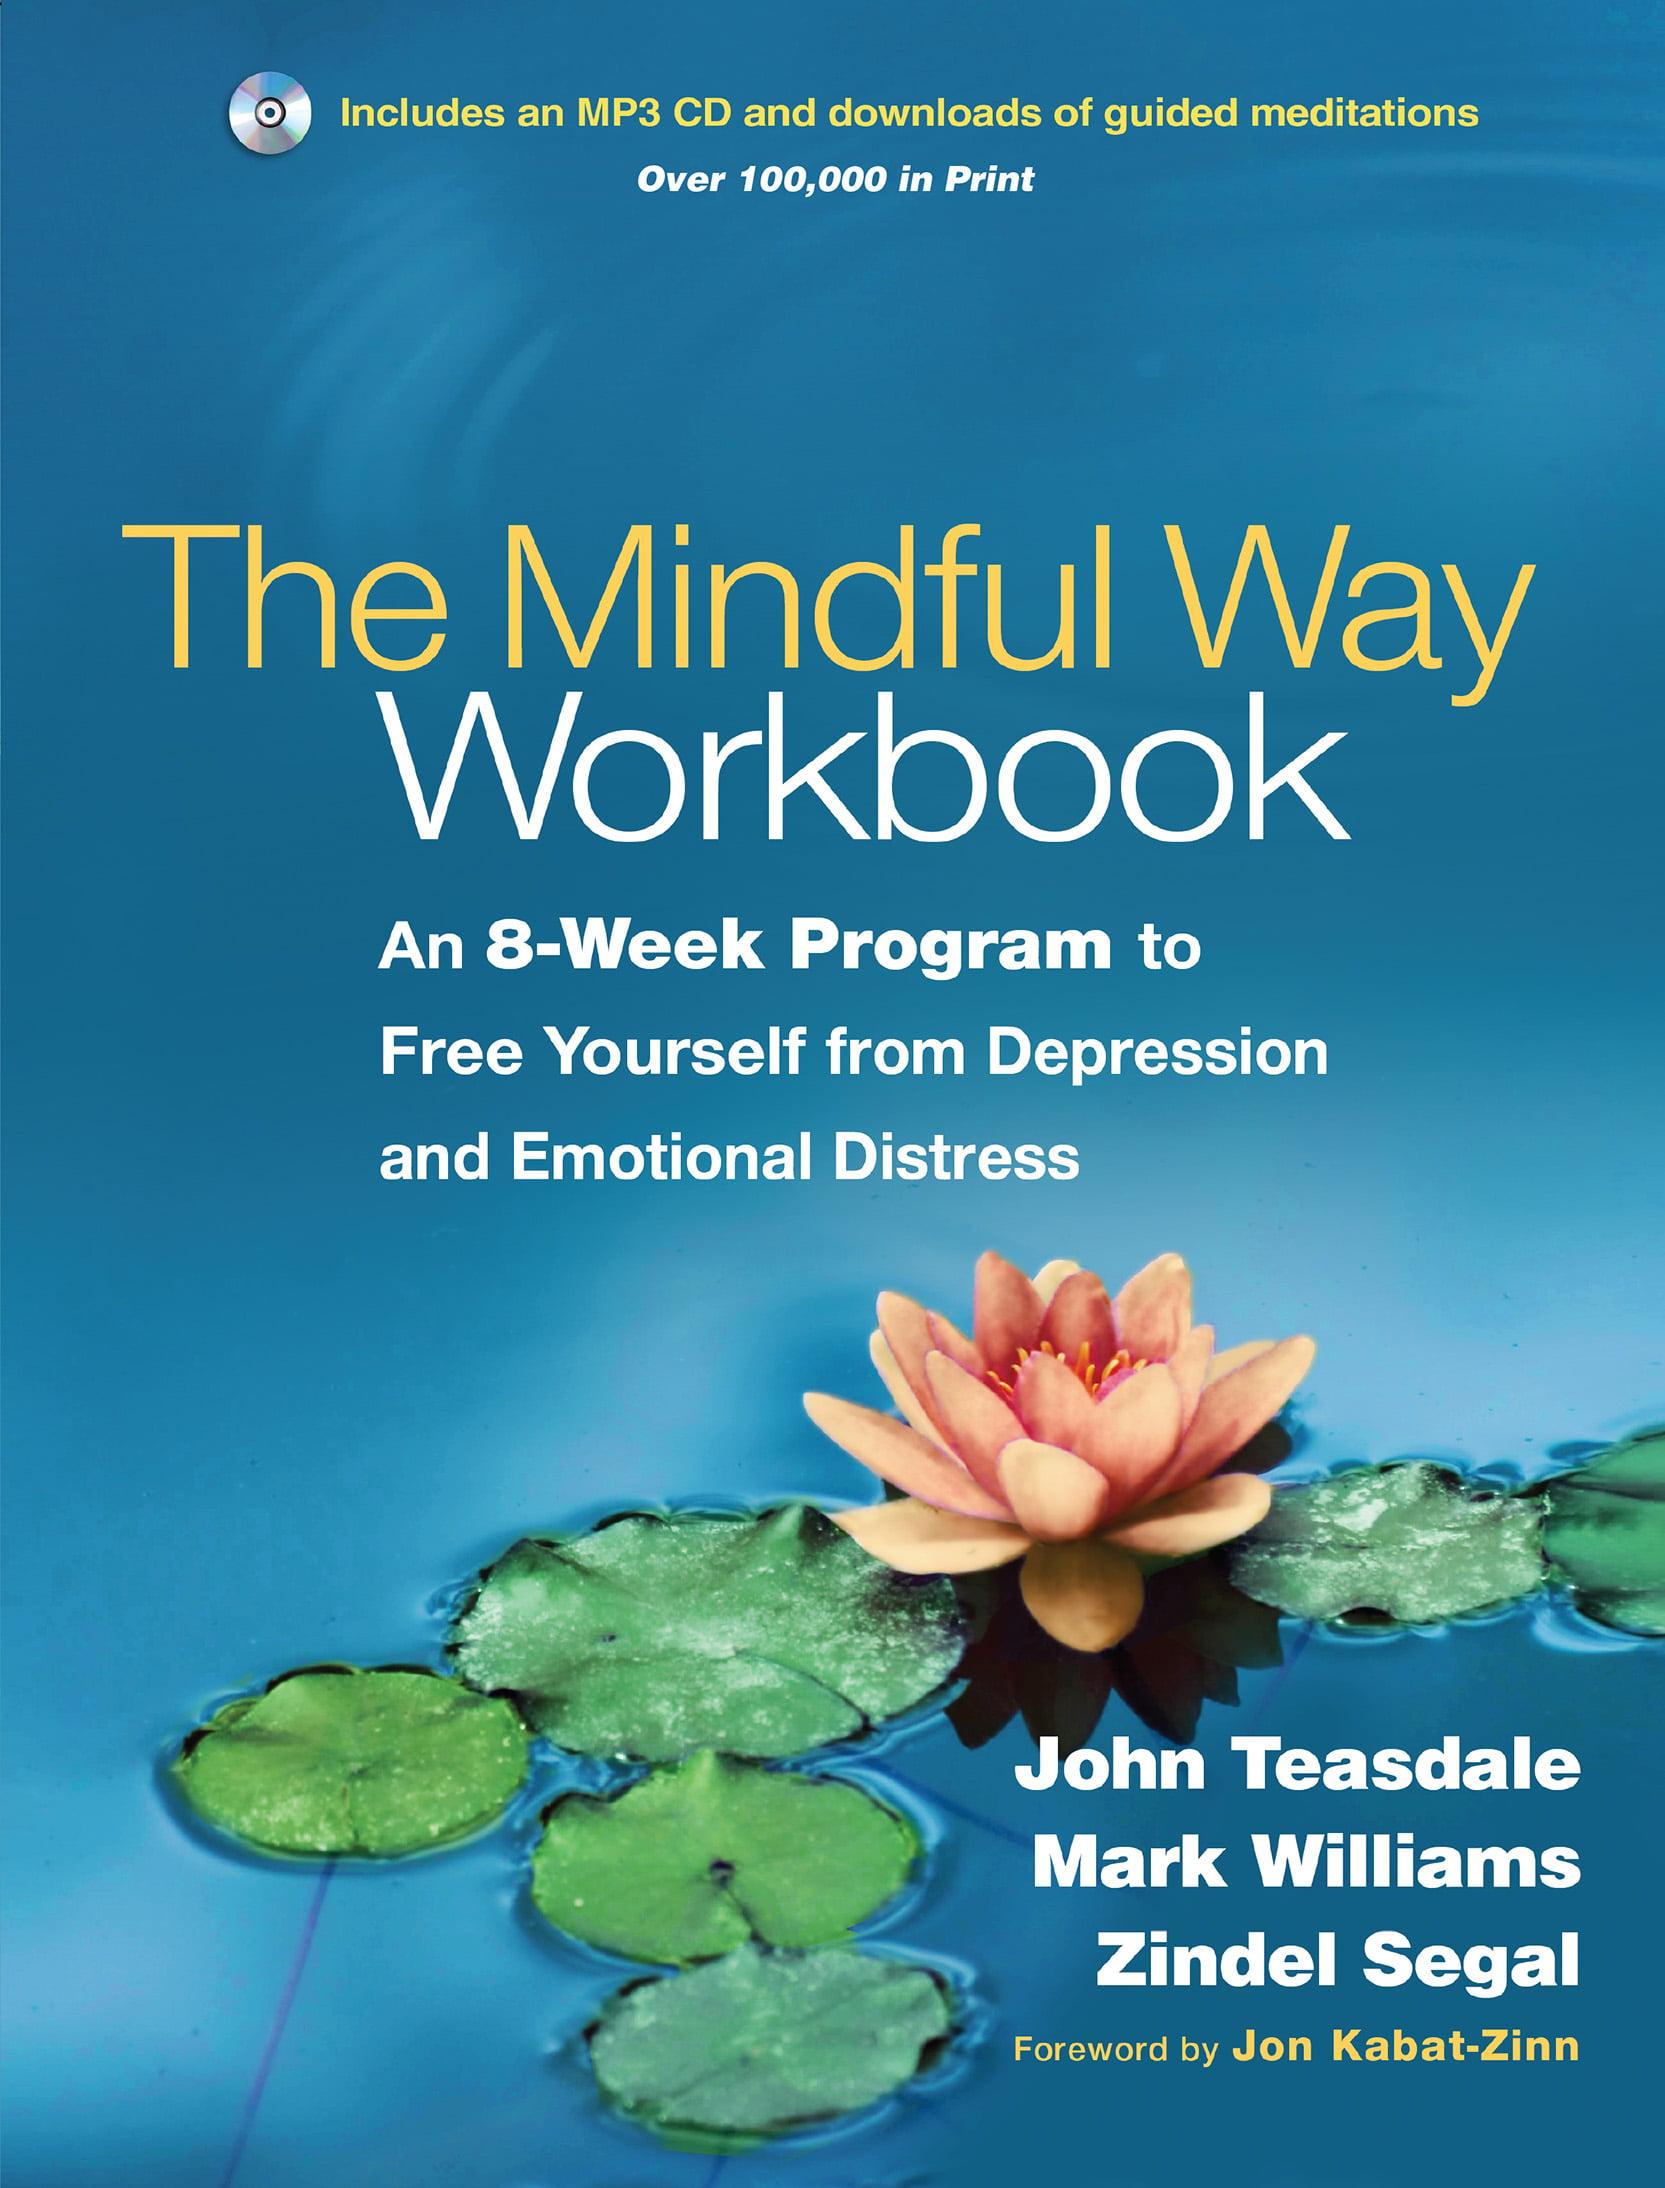 The Mindful Way Workbook Other Walmart